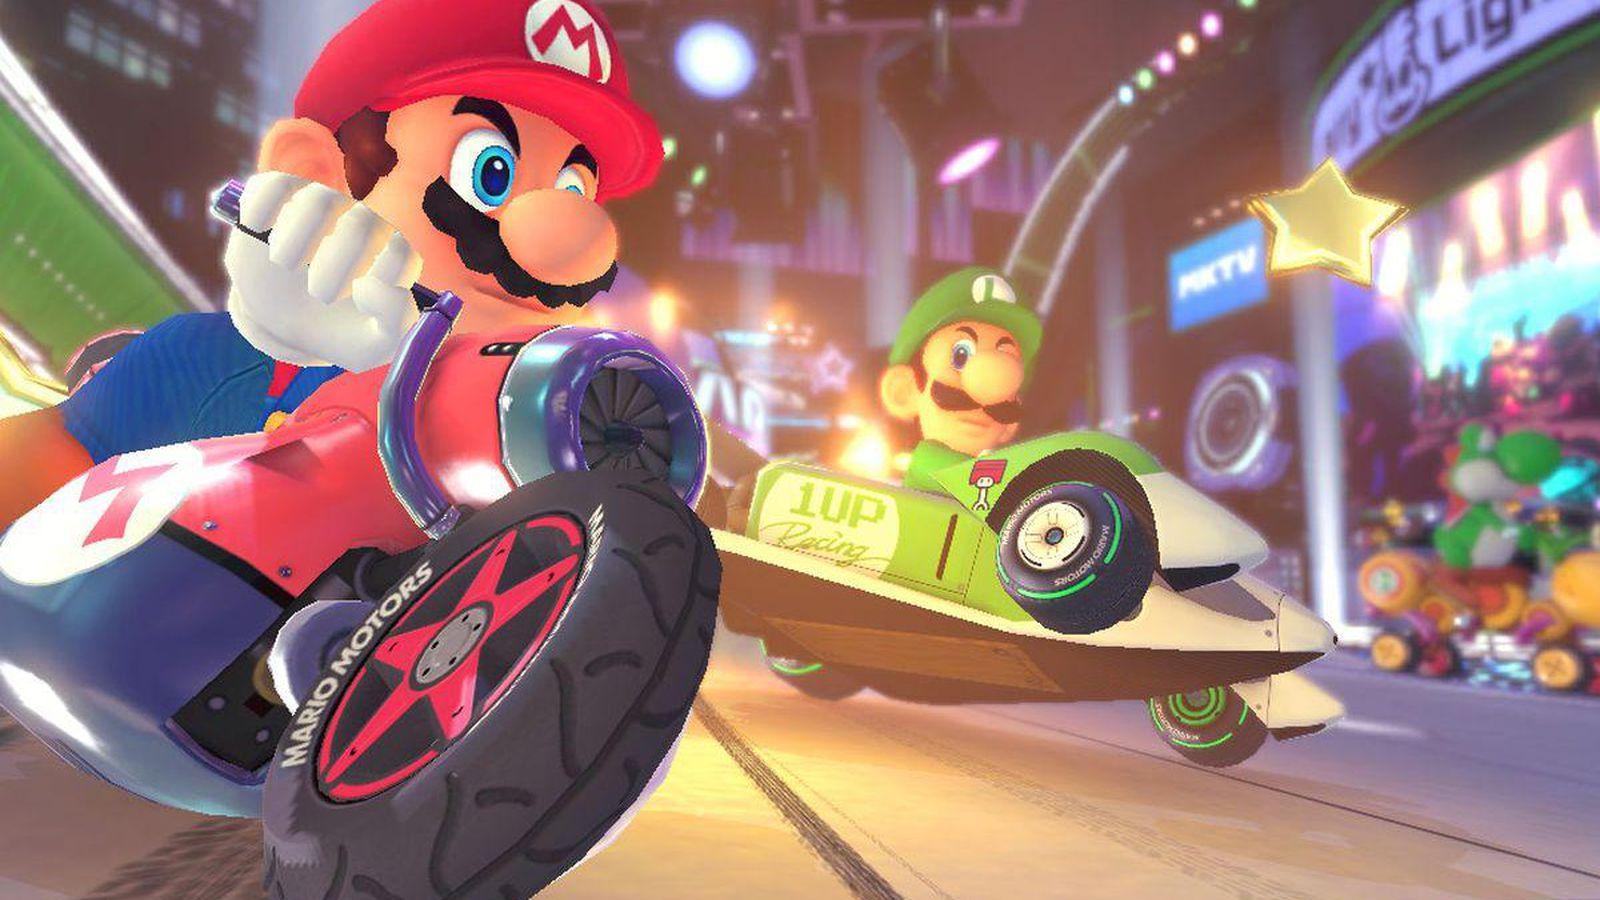 Mario Kart llegará a móviles